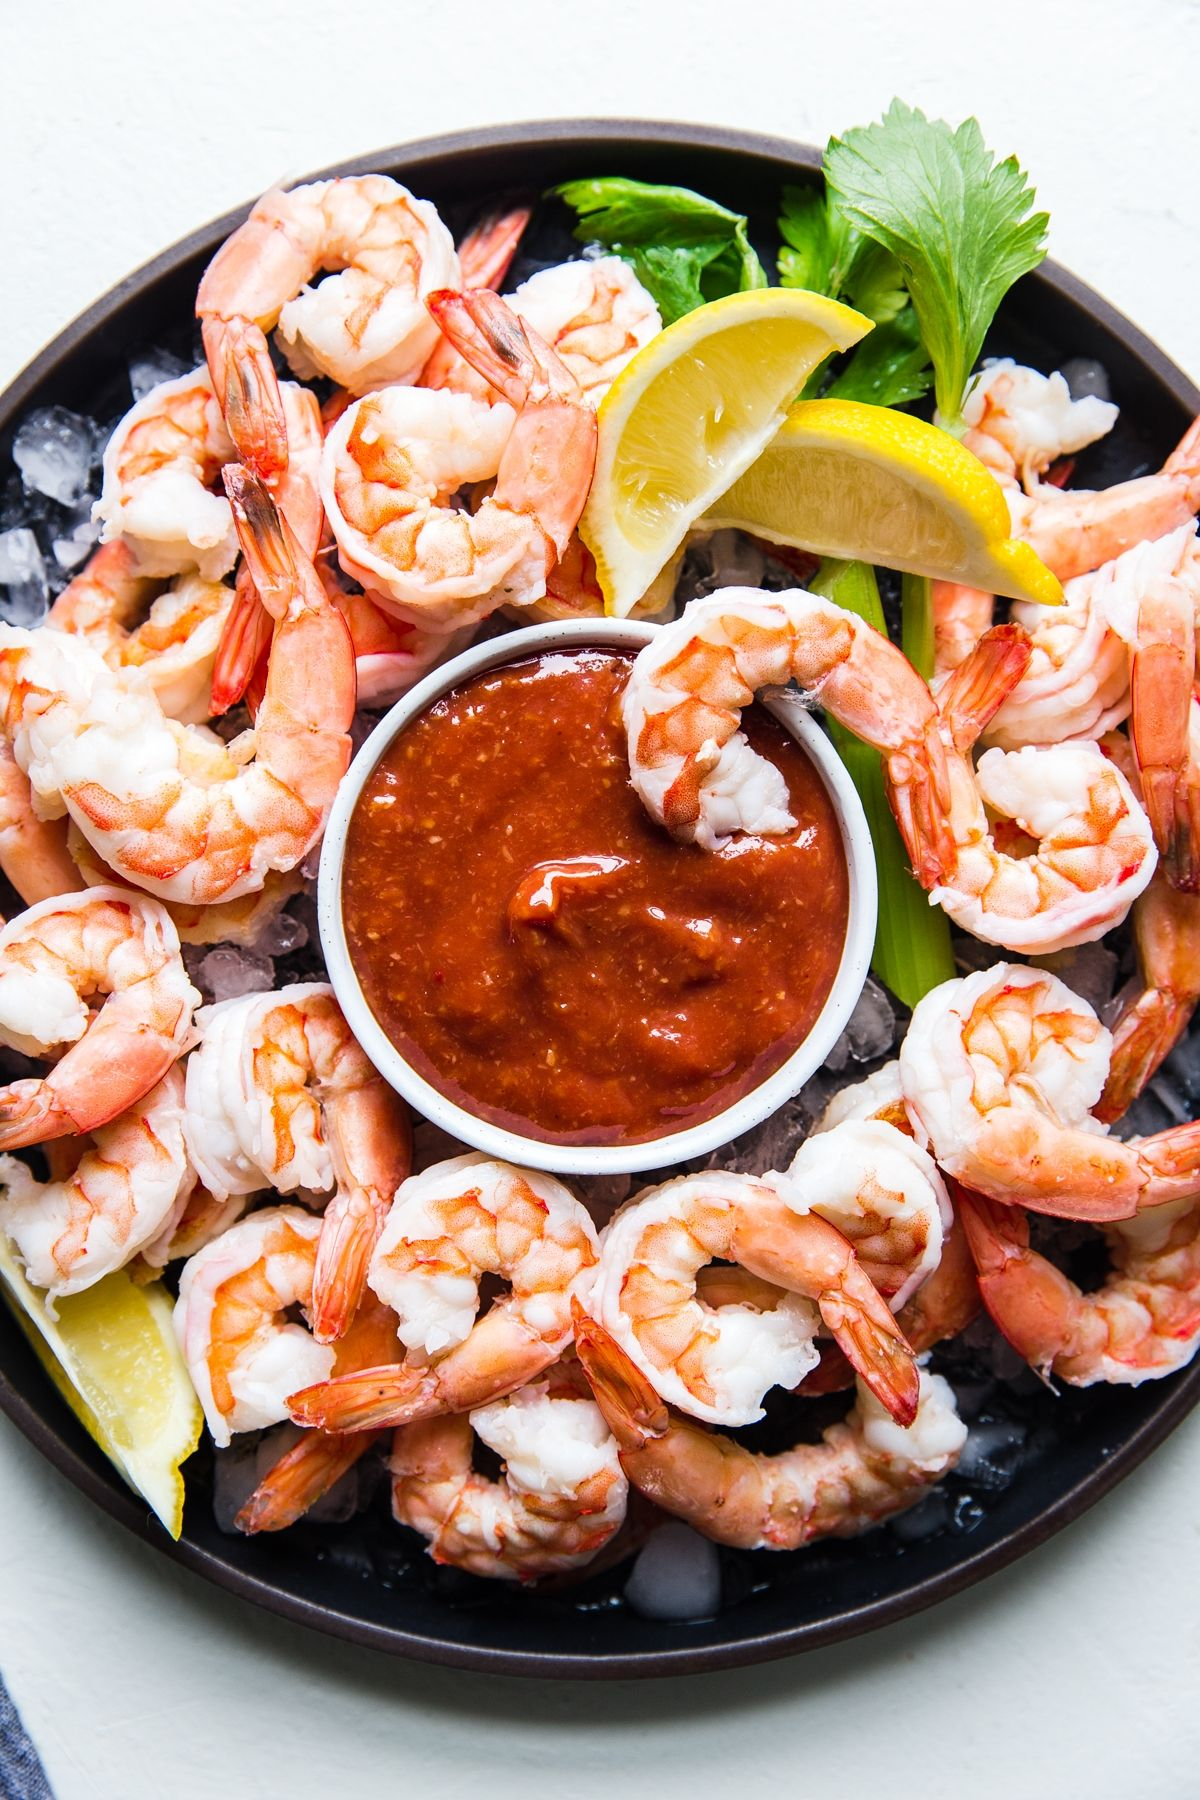 Shrimp Cocktail The Modern Proper Recipe In 2020 Recipes Shrimp Cocktail Crockpot Recipes Easy